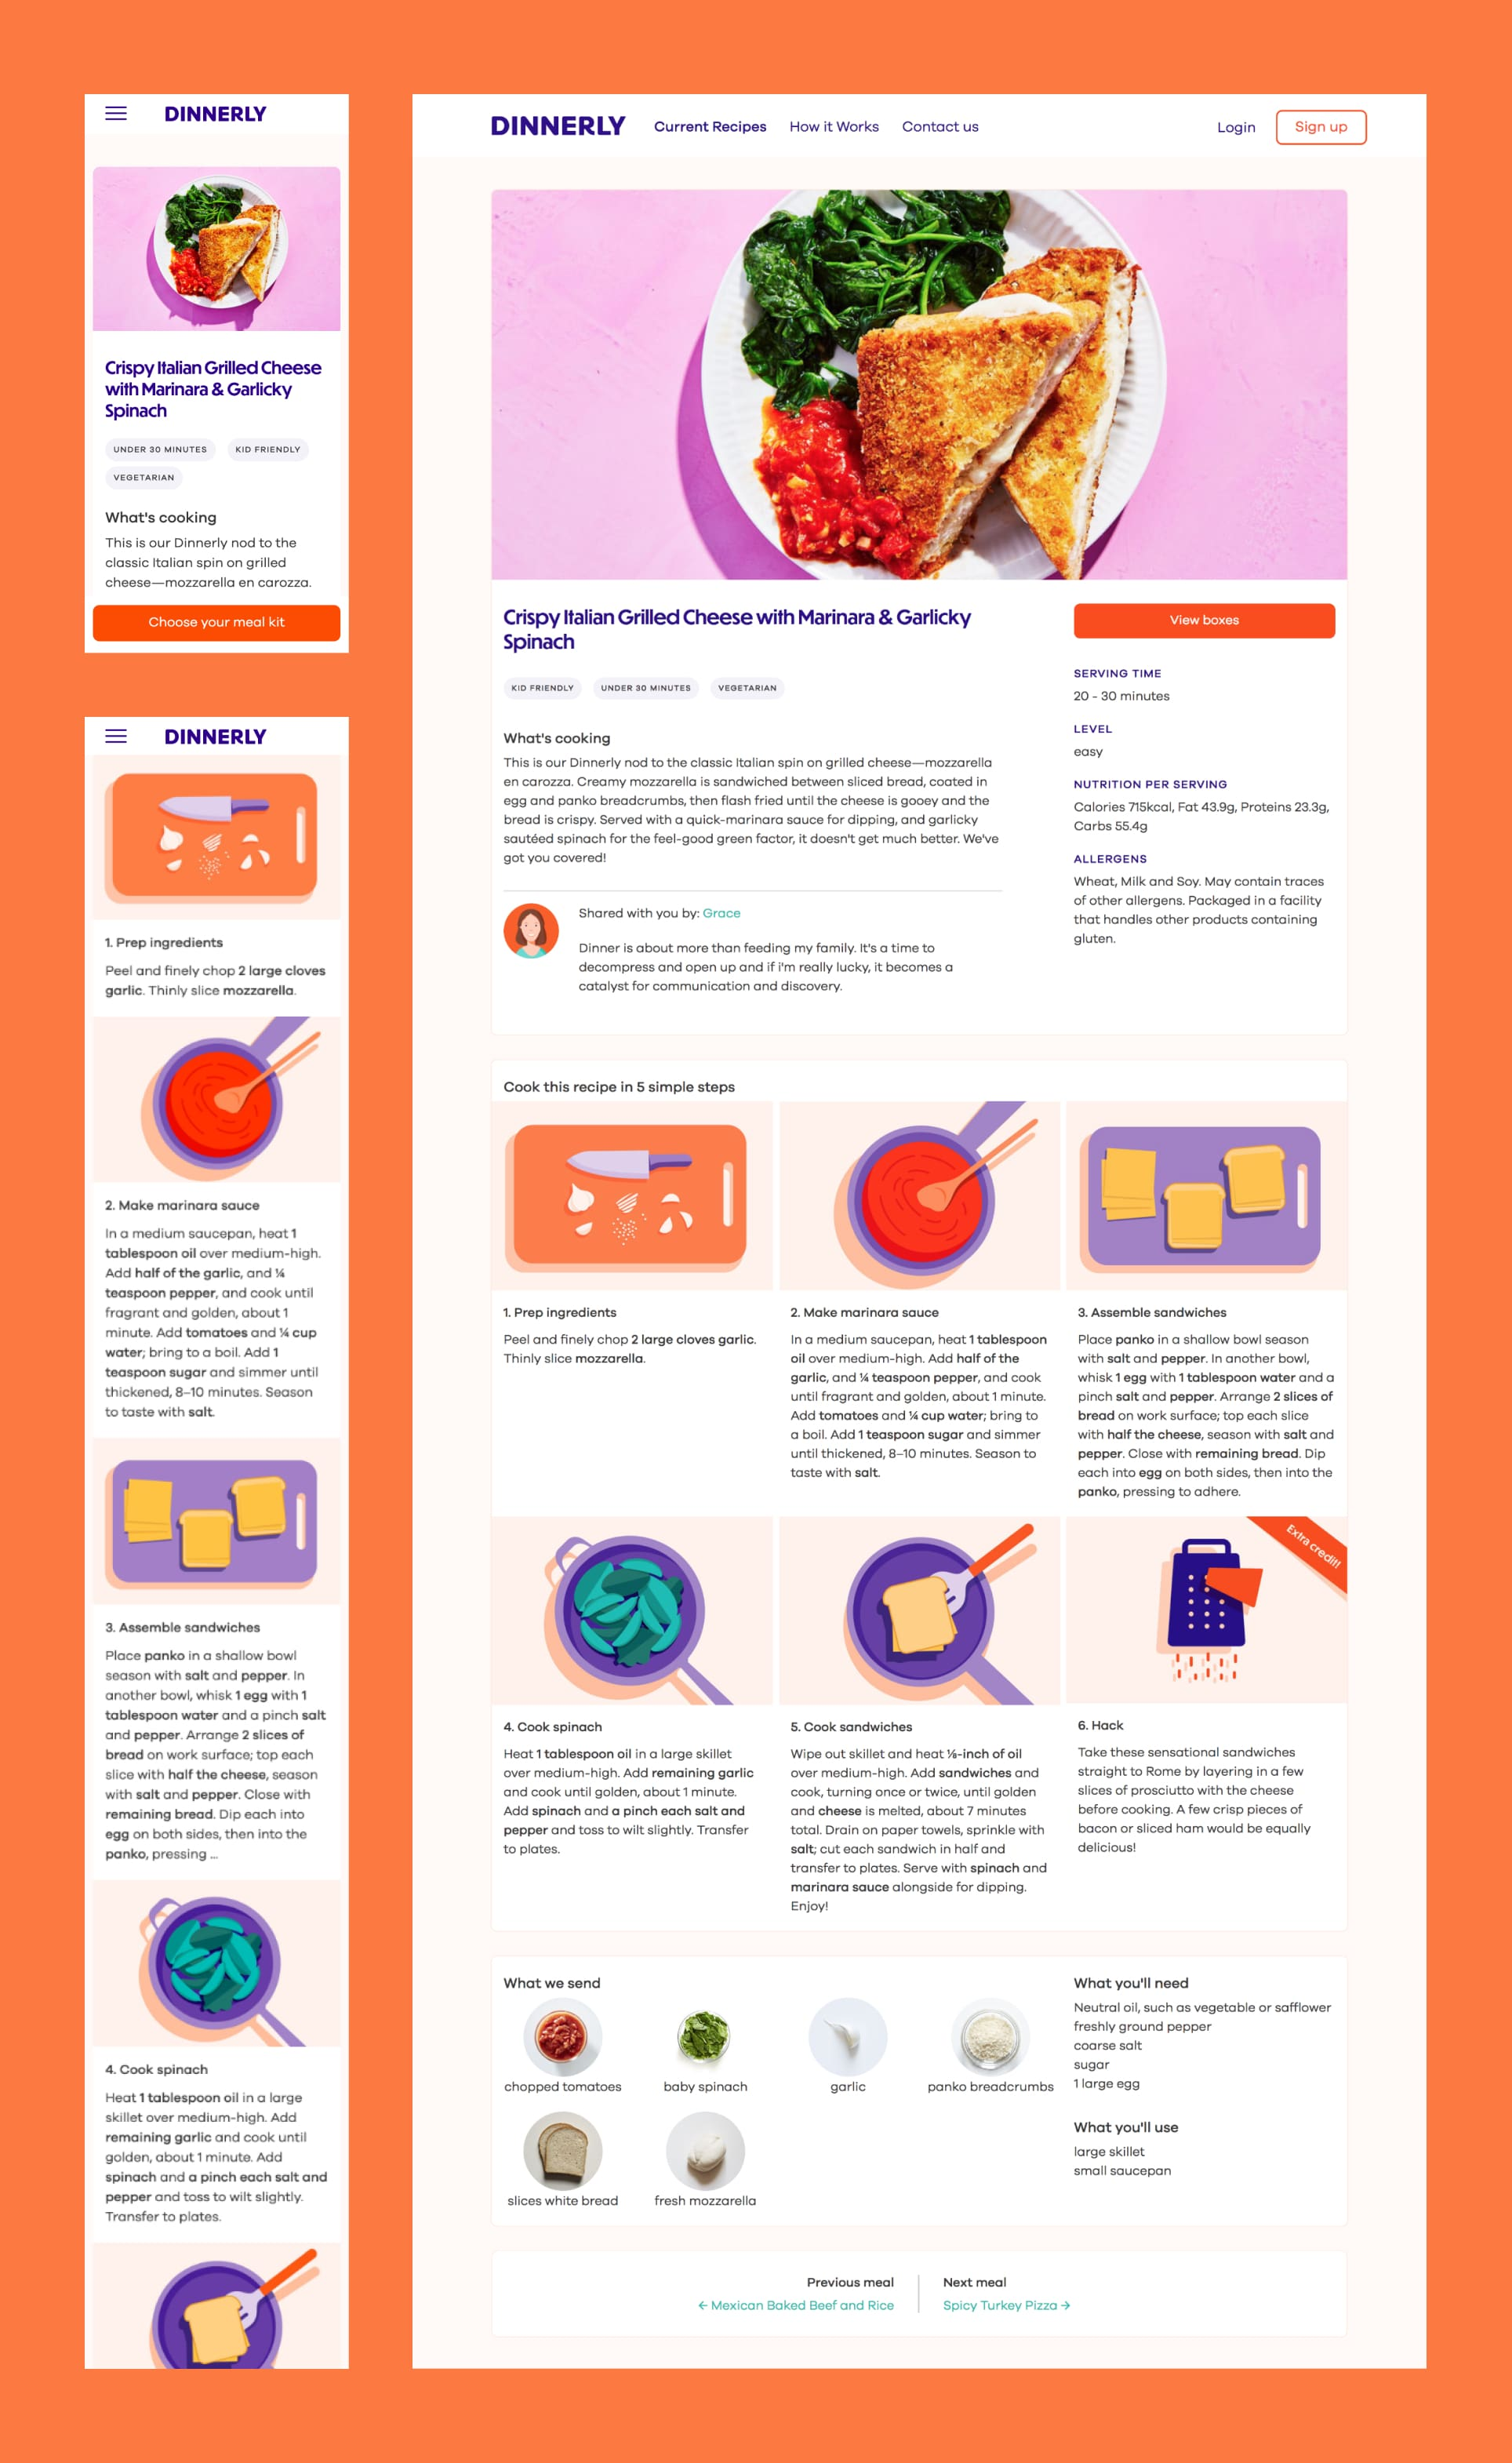 Dinnerly.com's Crispy Italian Grilled Cheese screenshots